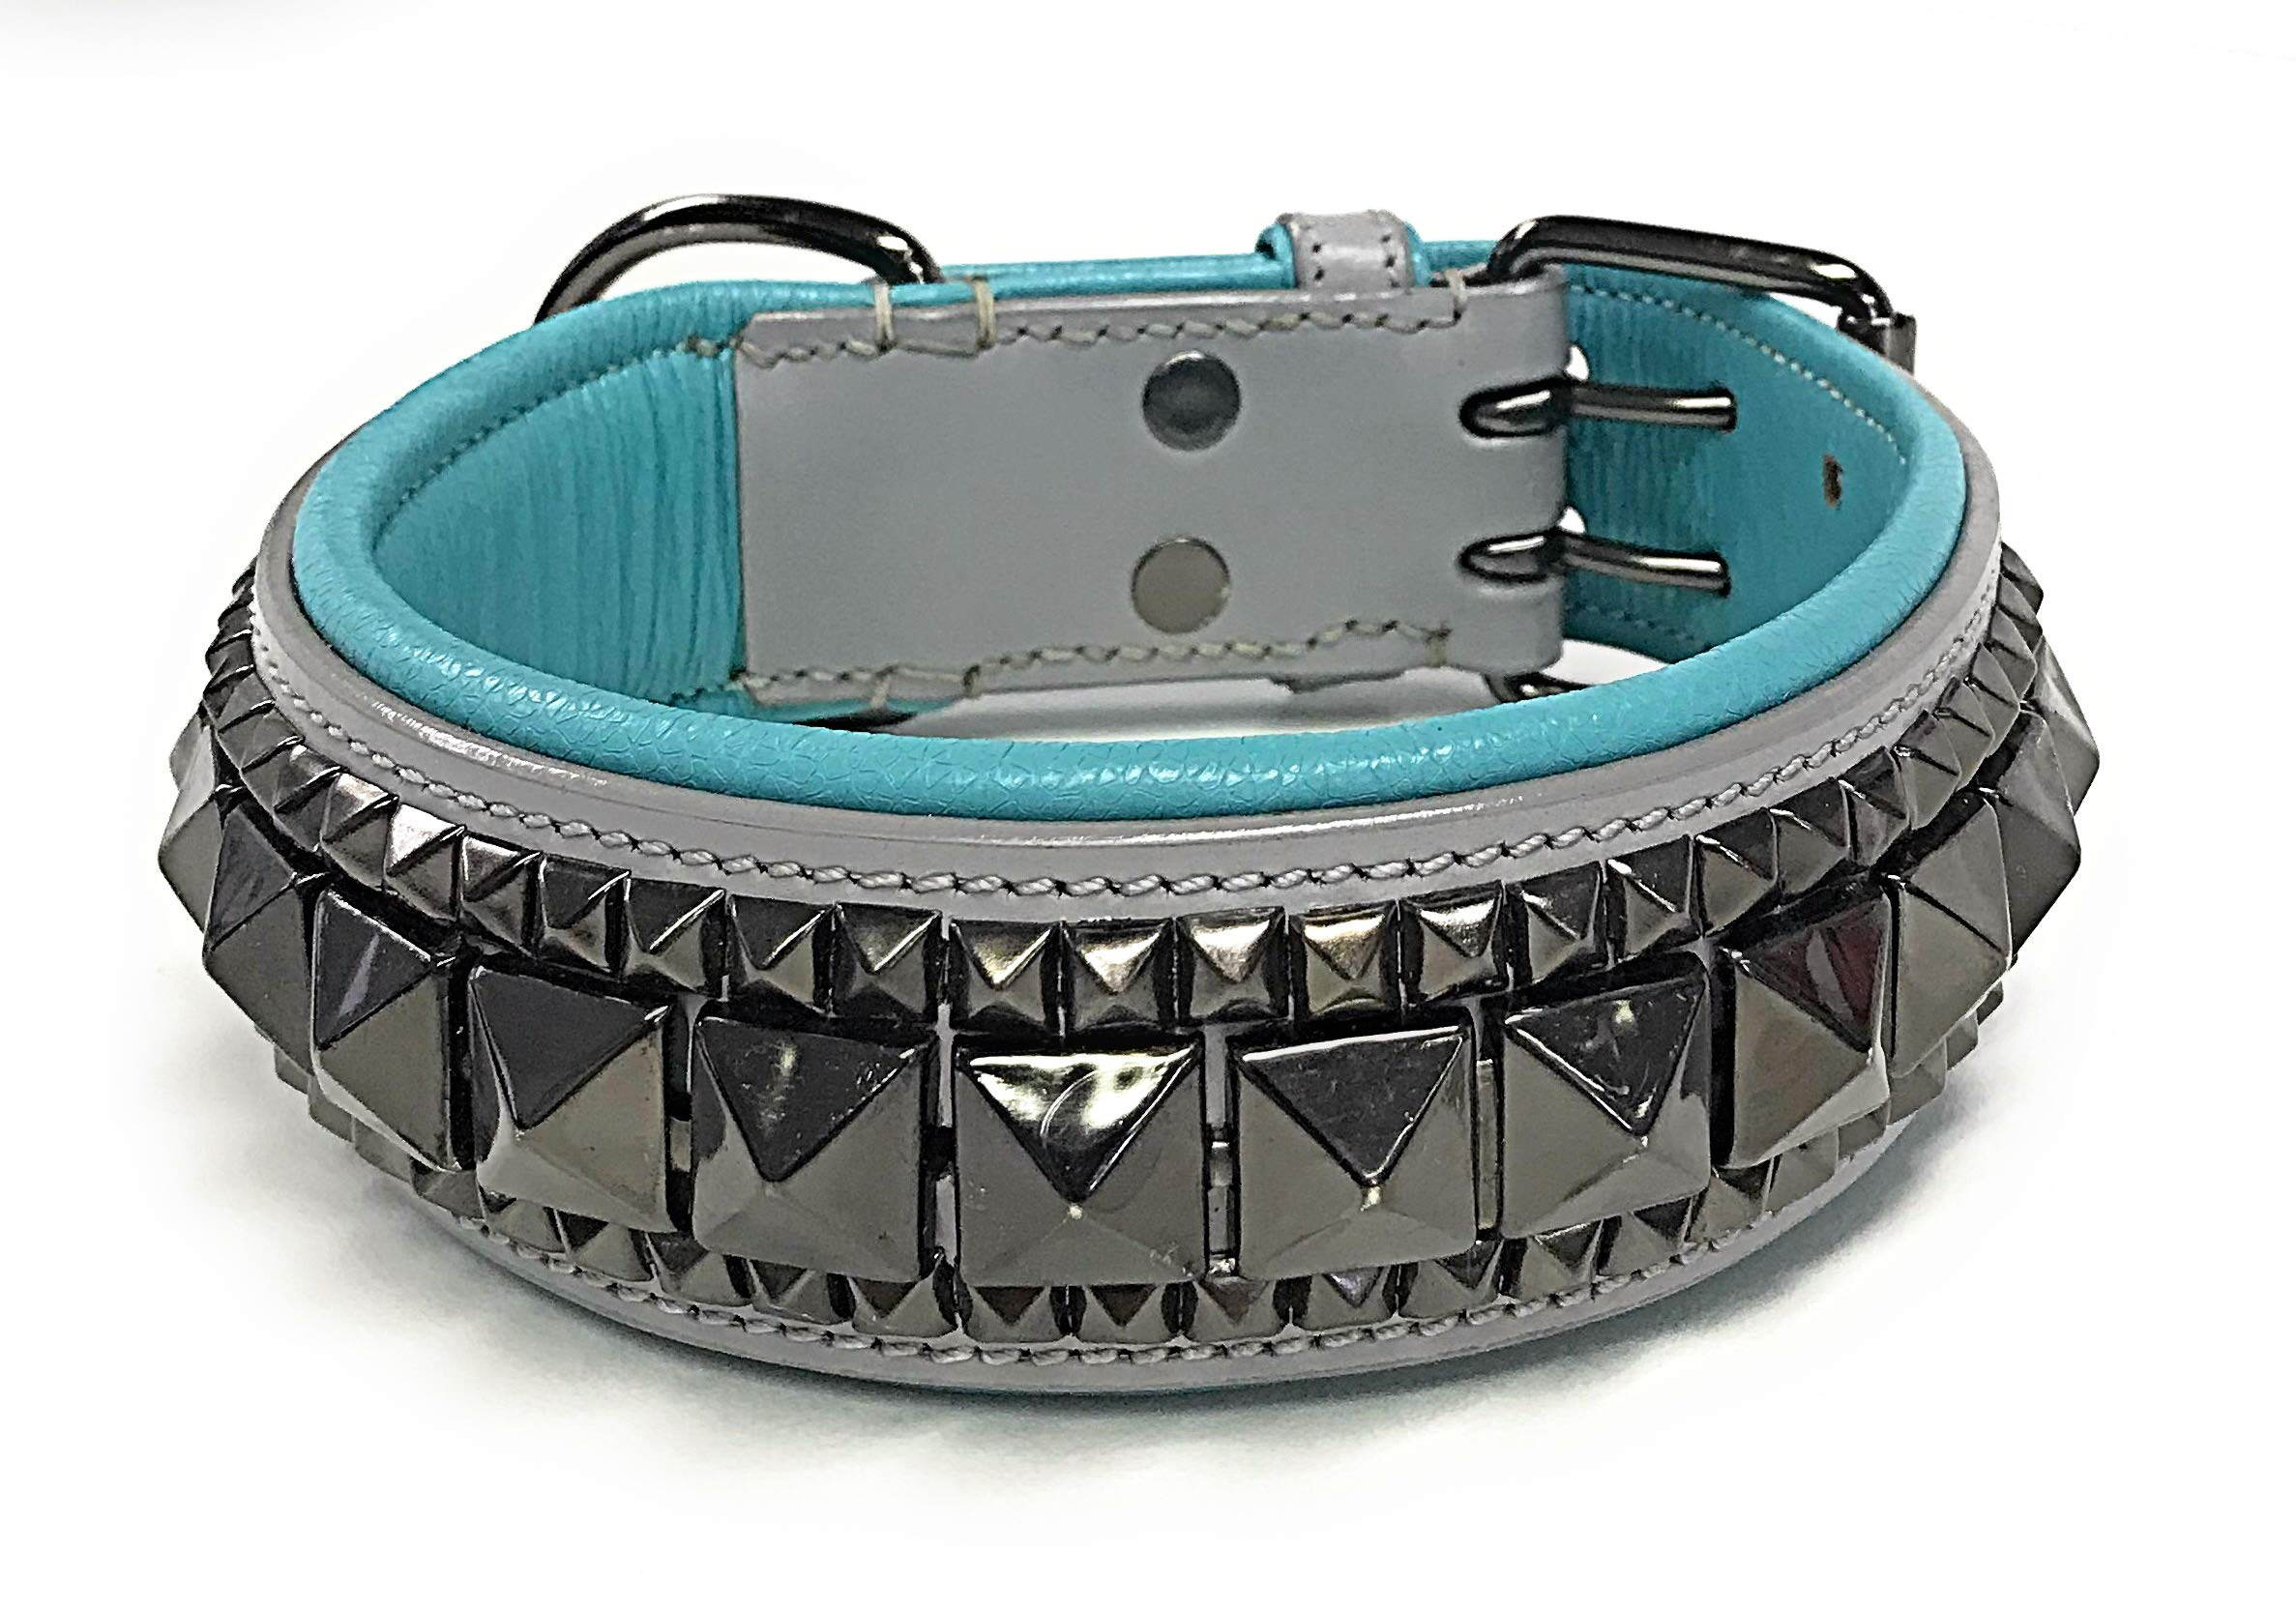 Luxury Leather Padded Dog Collar - Premium Pet - (Small, Medium, Large, XL) - by LUX (Large, Gray/Blue Padding)